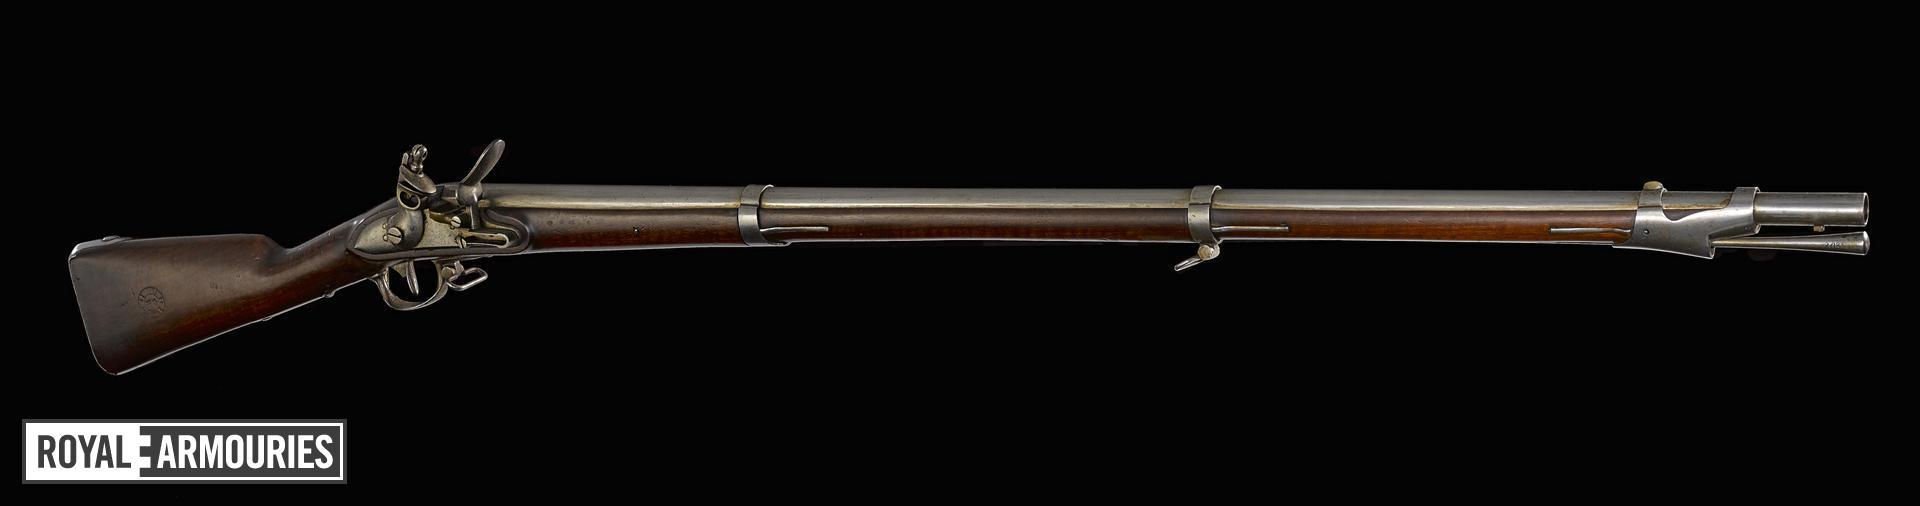 Flintlock military musket - Model 1815 No.2